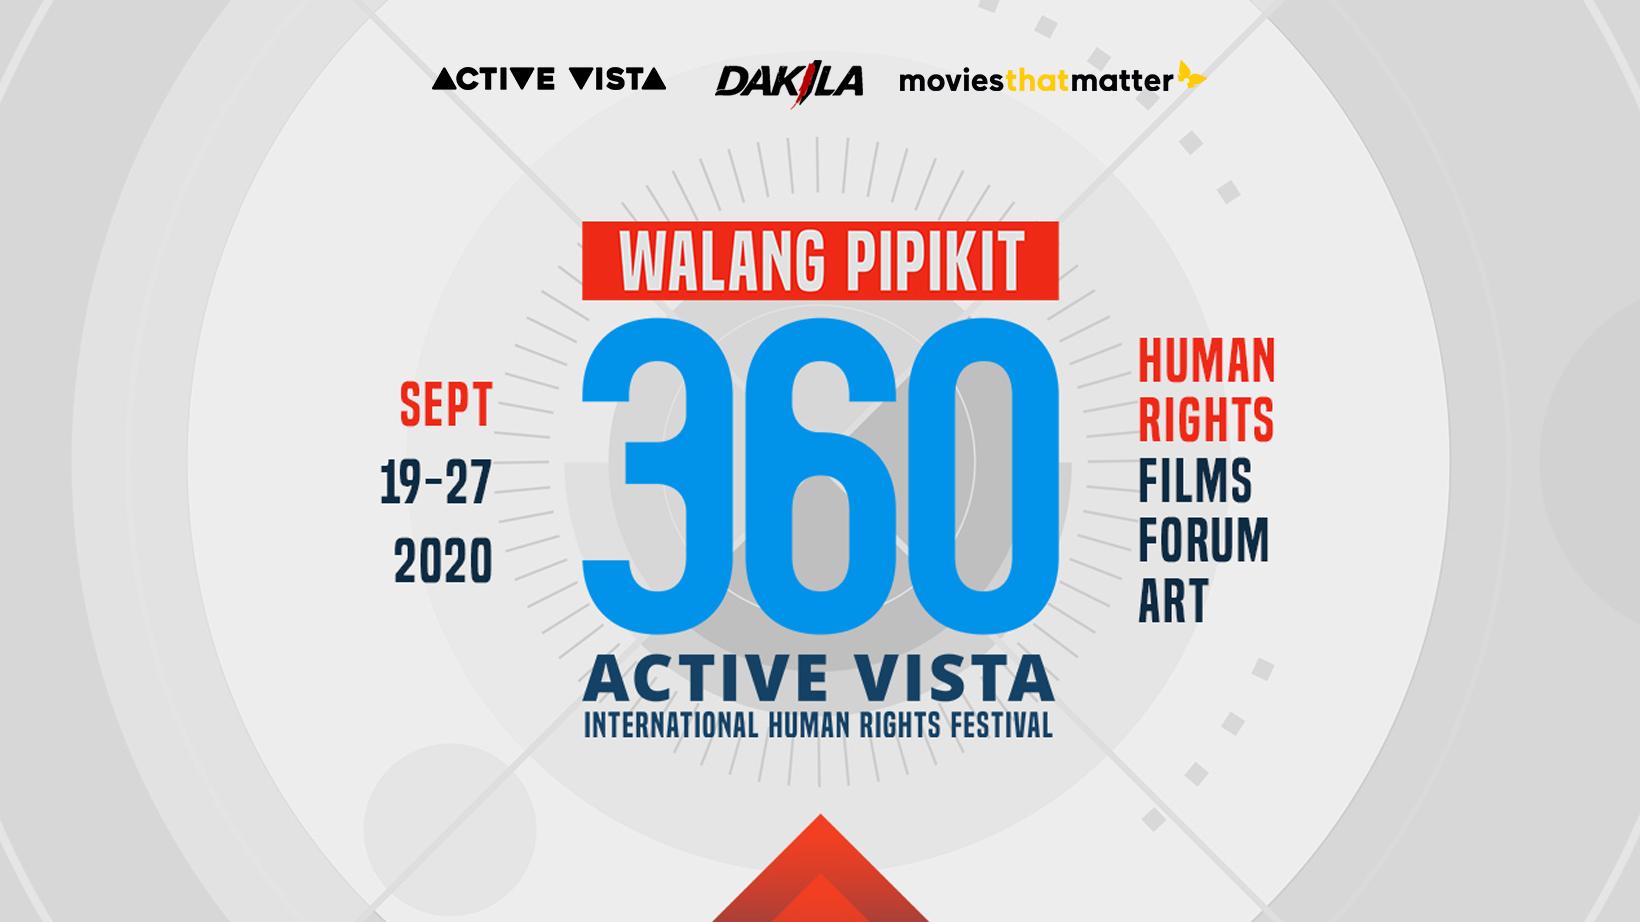 Active Vista International Human Rights Festival